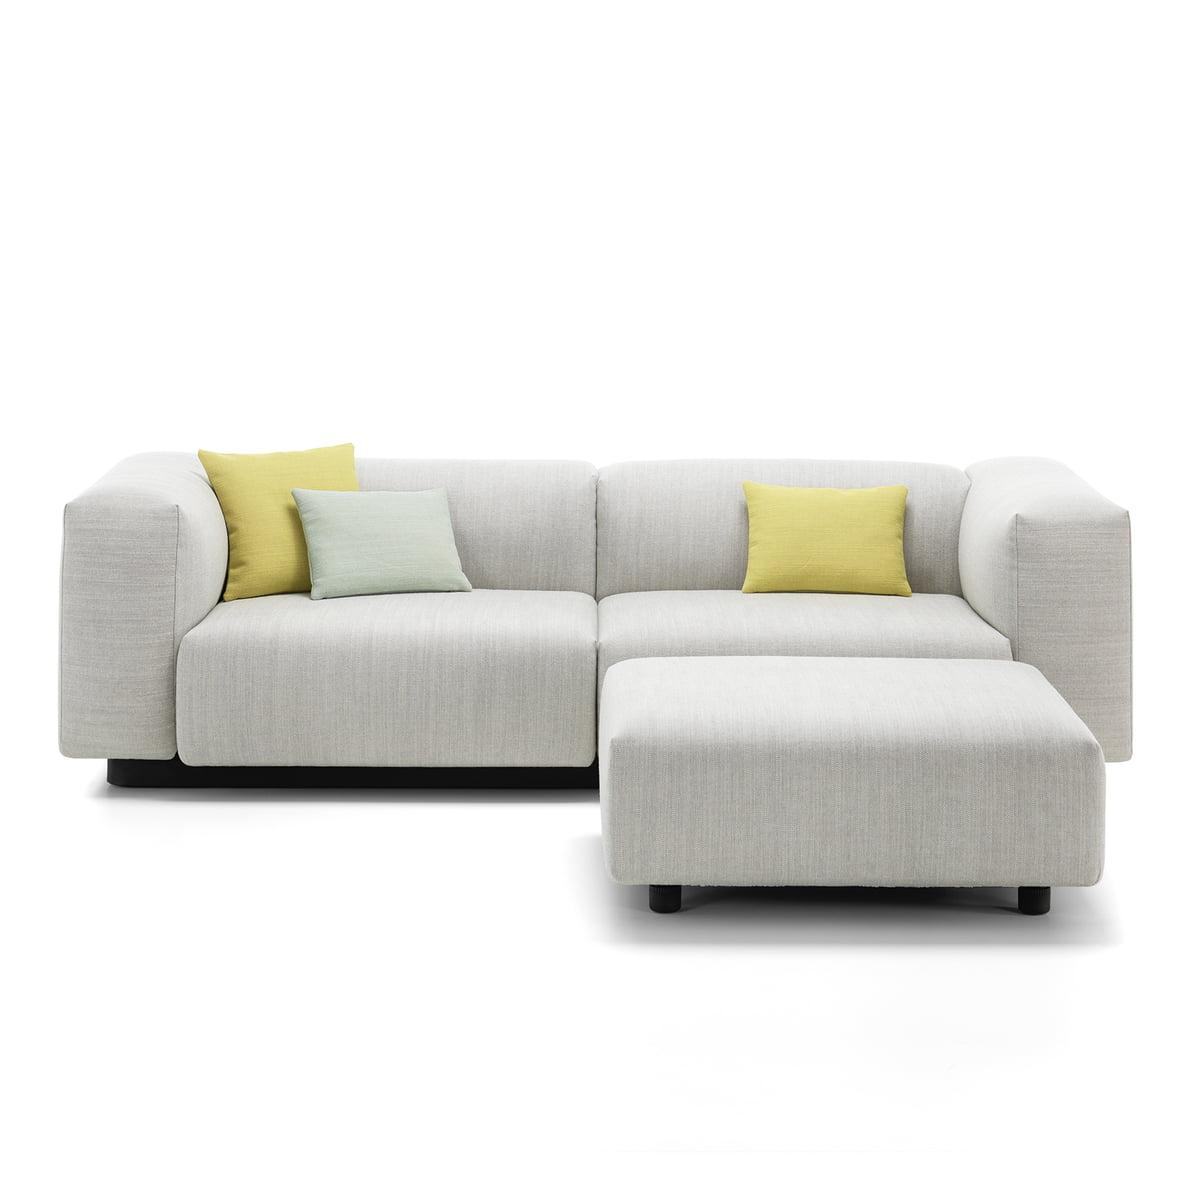 soft modular sofa 2 sitzer von vitra connox. Black Bedroom Furniture Sets. Home Design Ideas